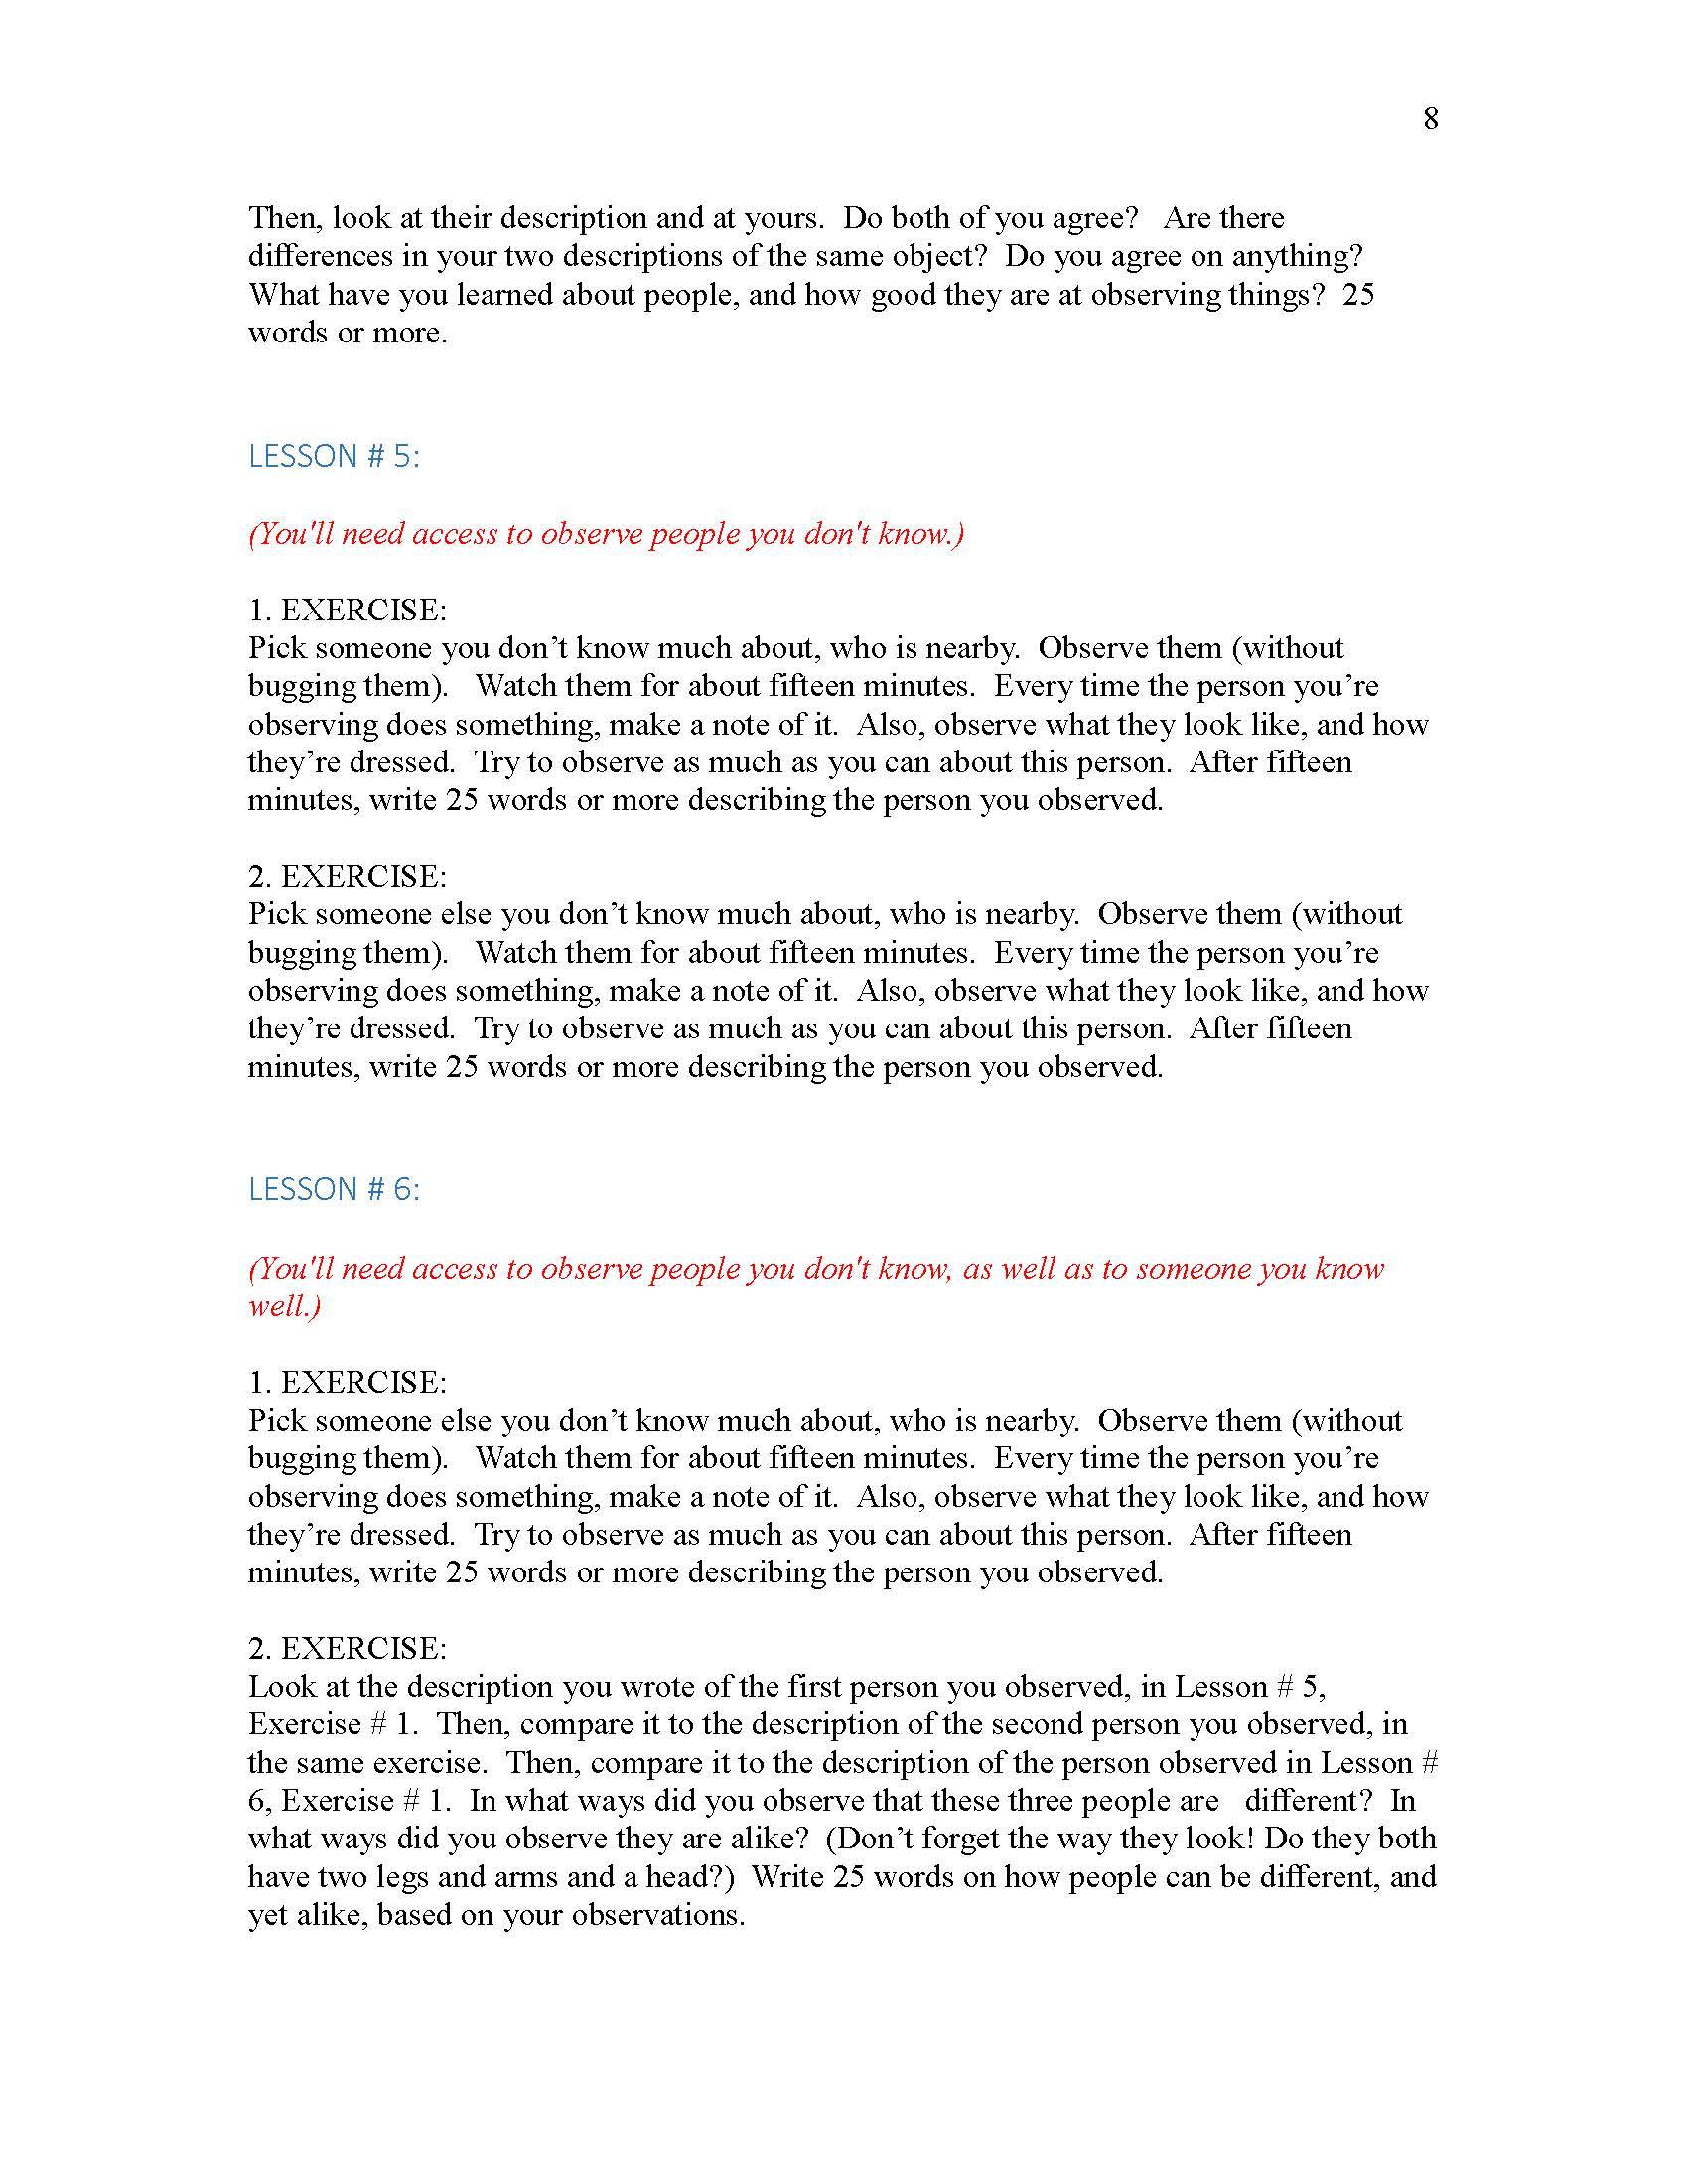 Samples Step 3 Science 1 - Science Basics_Page_09.jpg